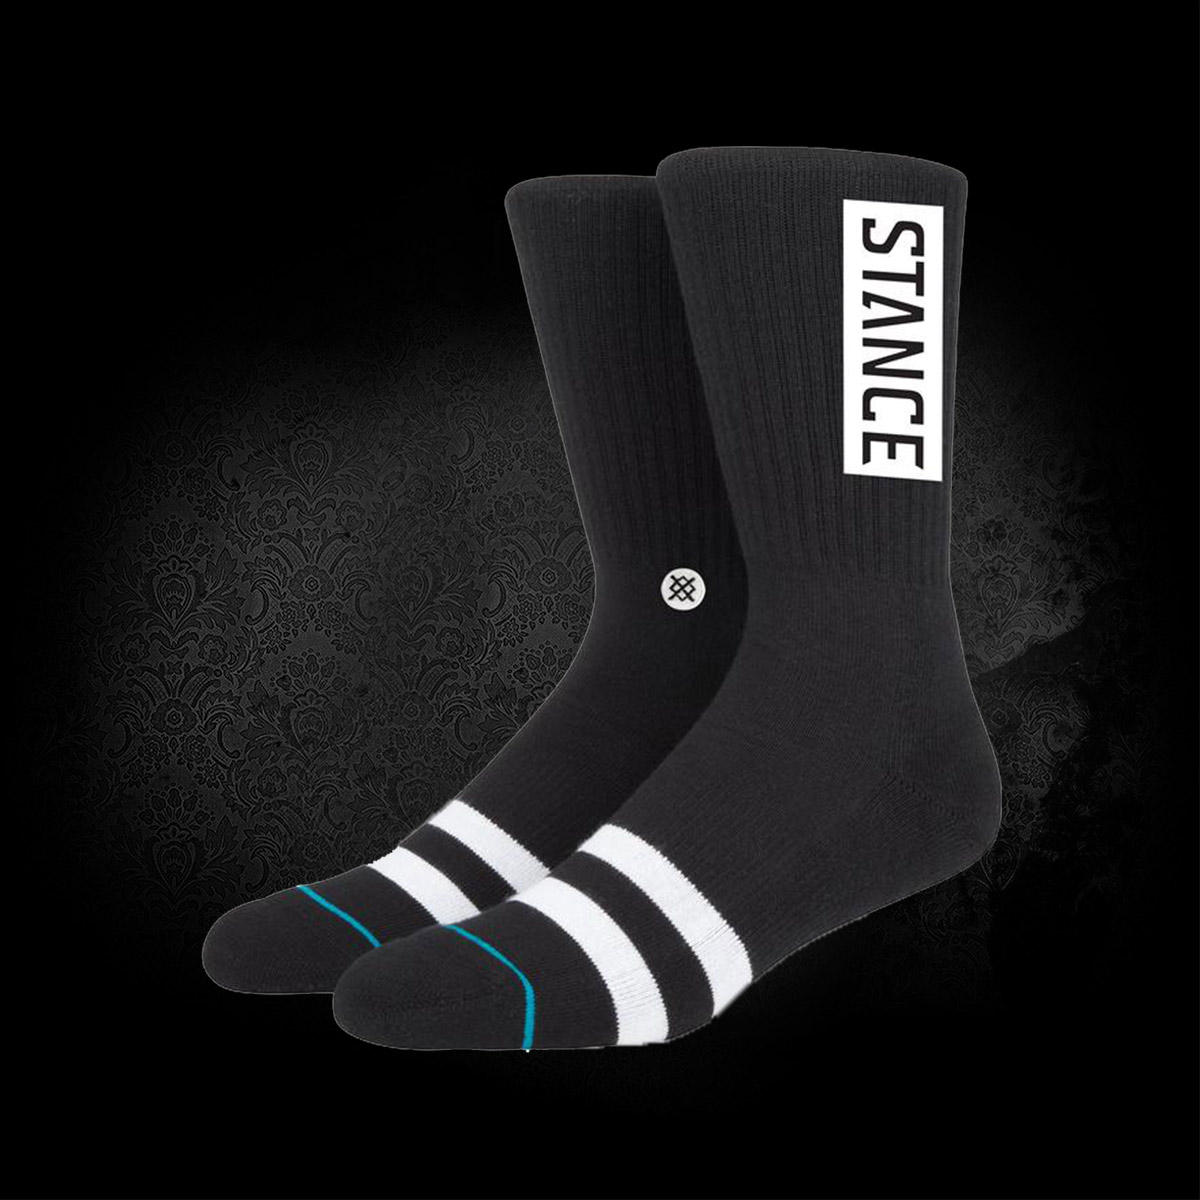 STANCE Čarape OG